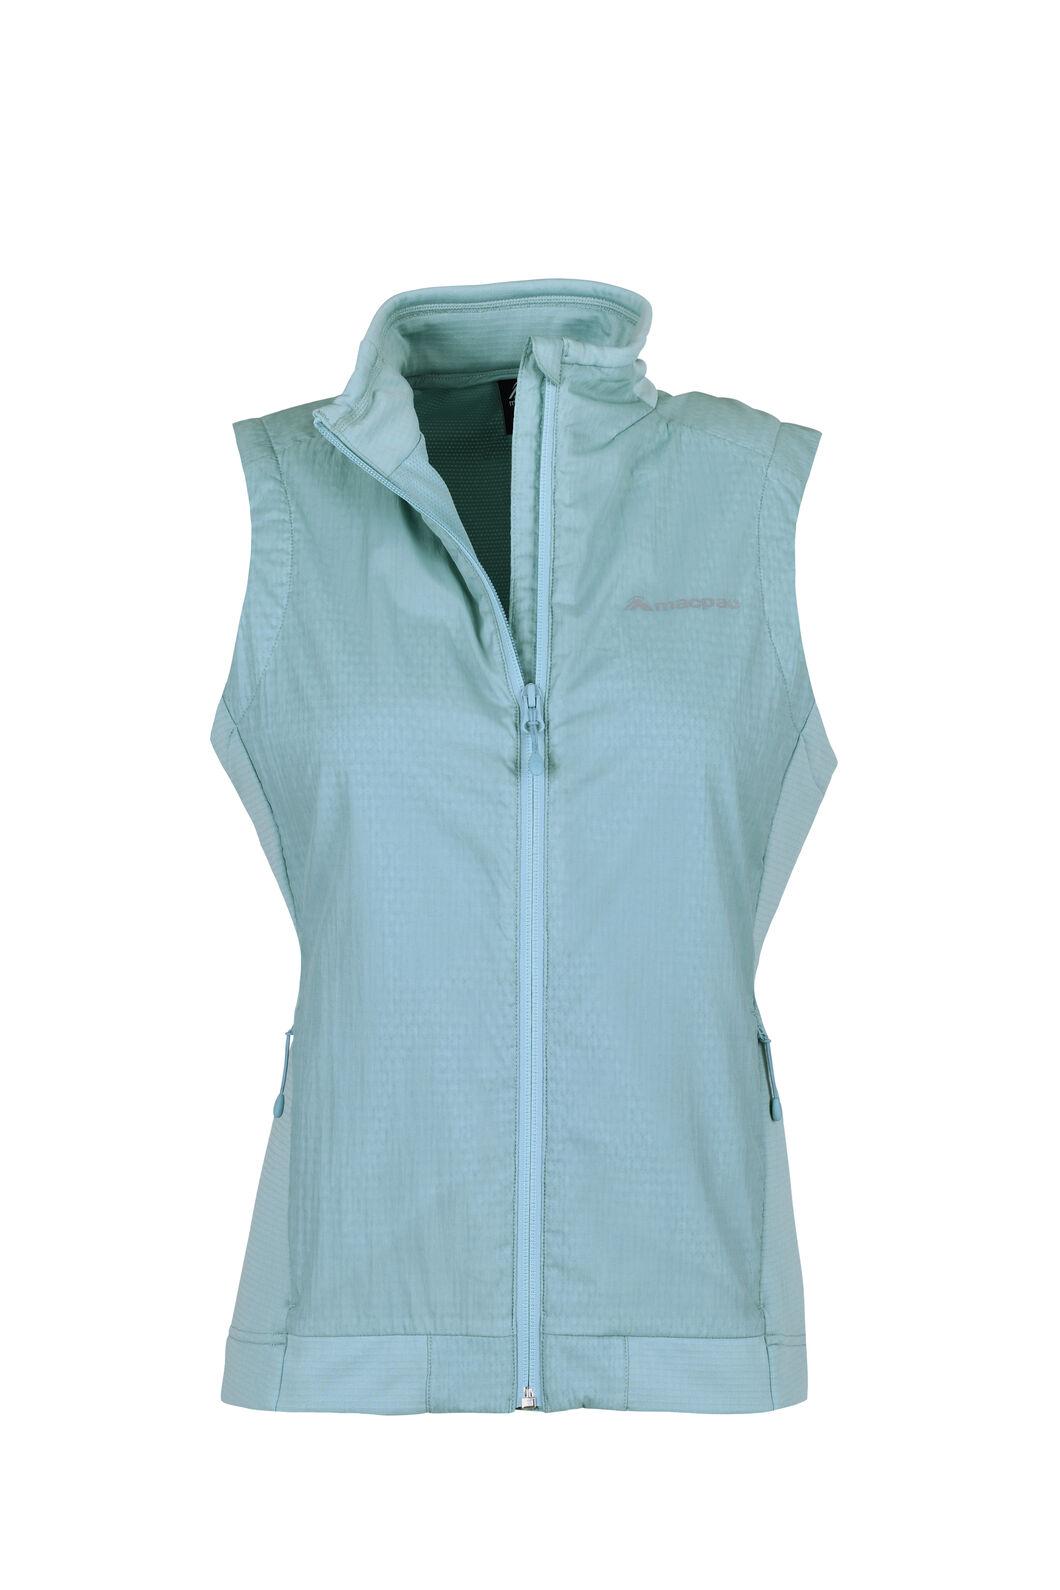 Macpac Saros Polartec® Alpha® Vest - Women's, Canton, hi-res